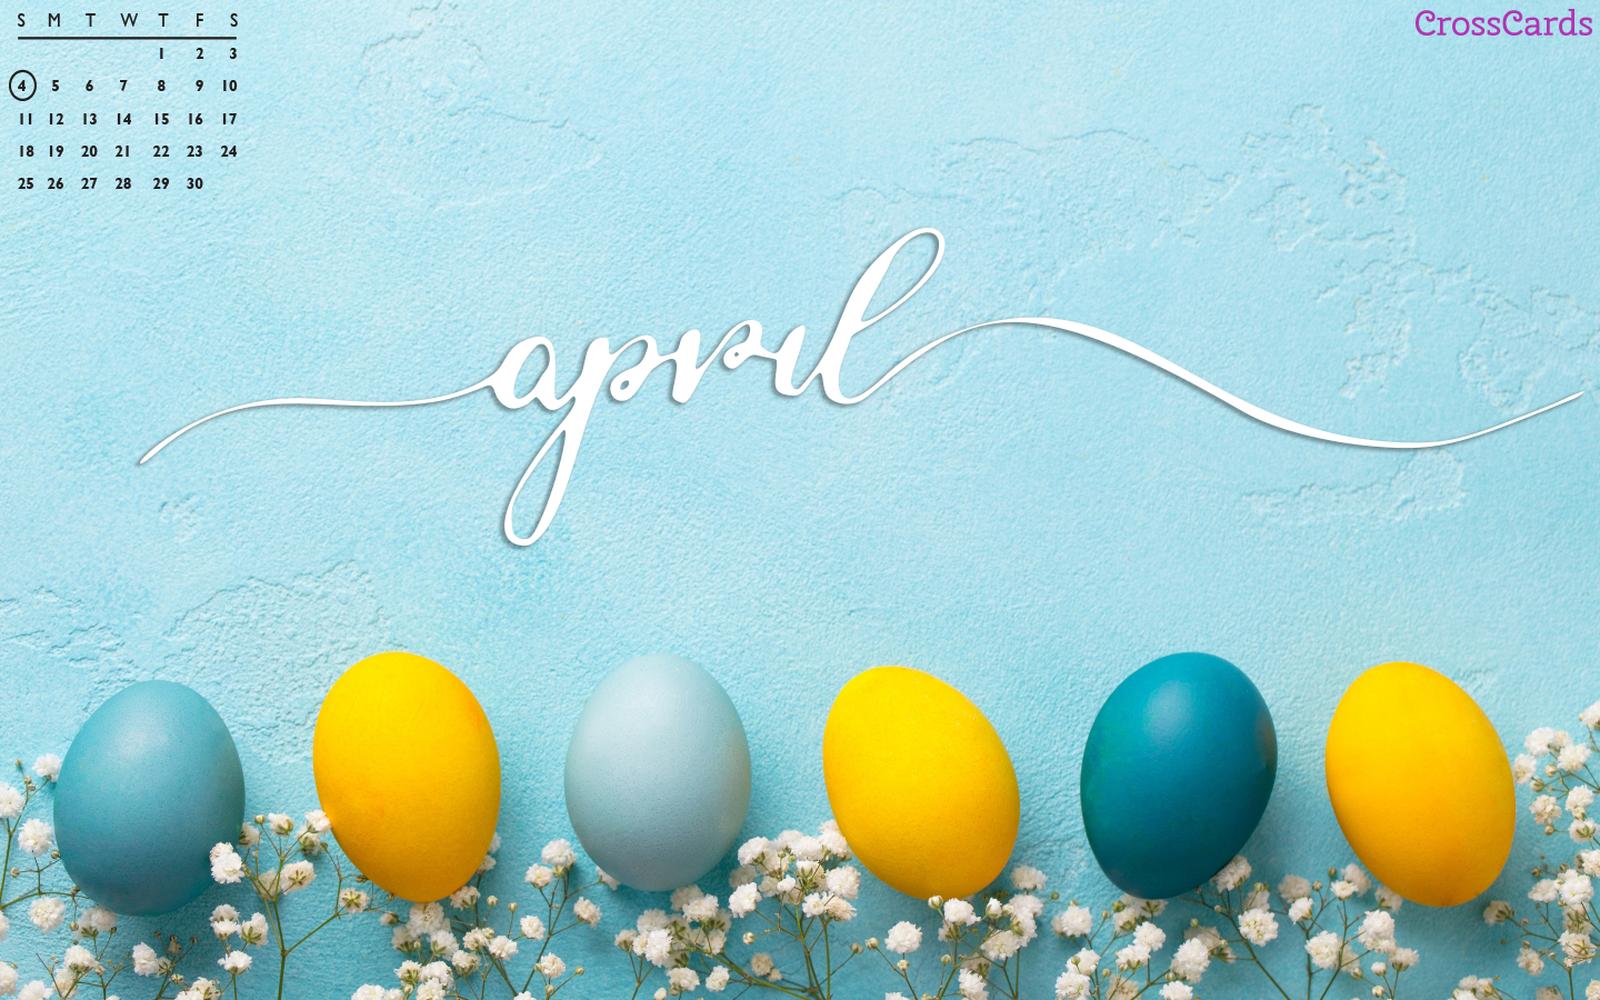 April 2021 - Easter Eggs mobile phone wallpaper